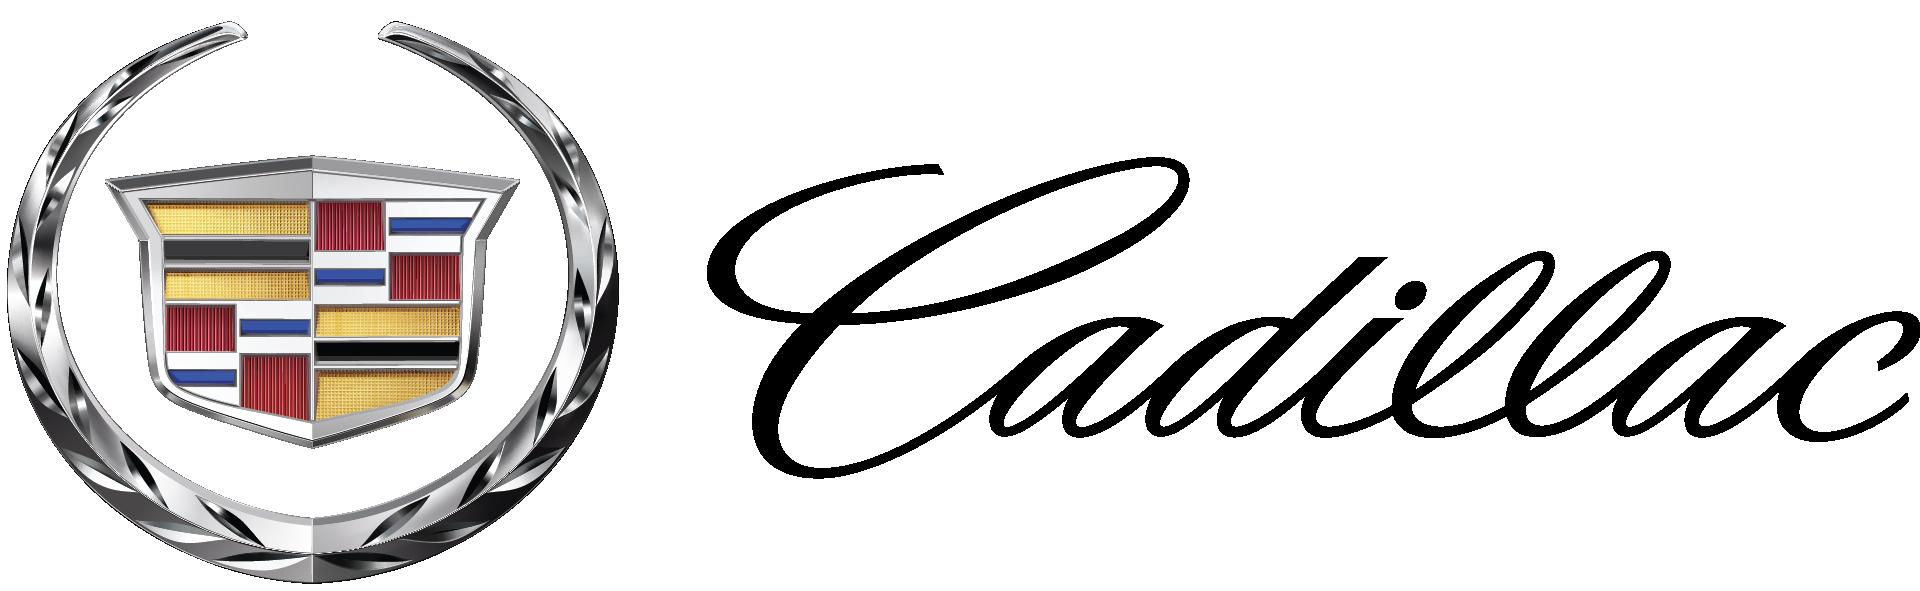 Download Cadillac Logo Free Download Png HQ PNG Image